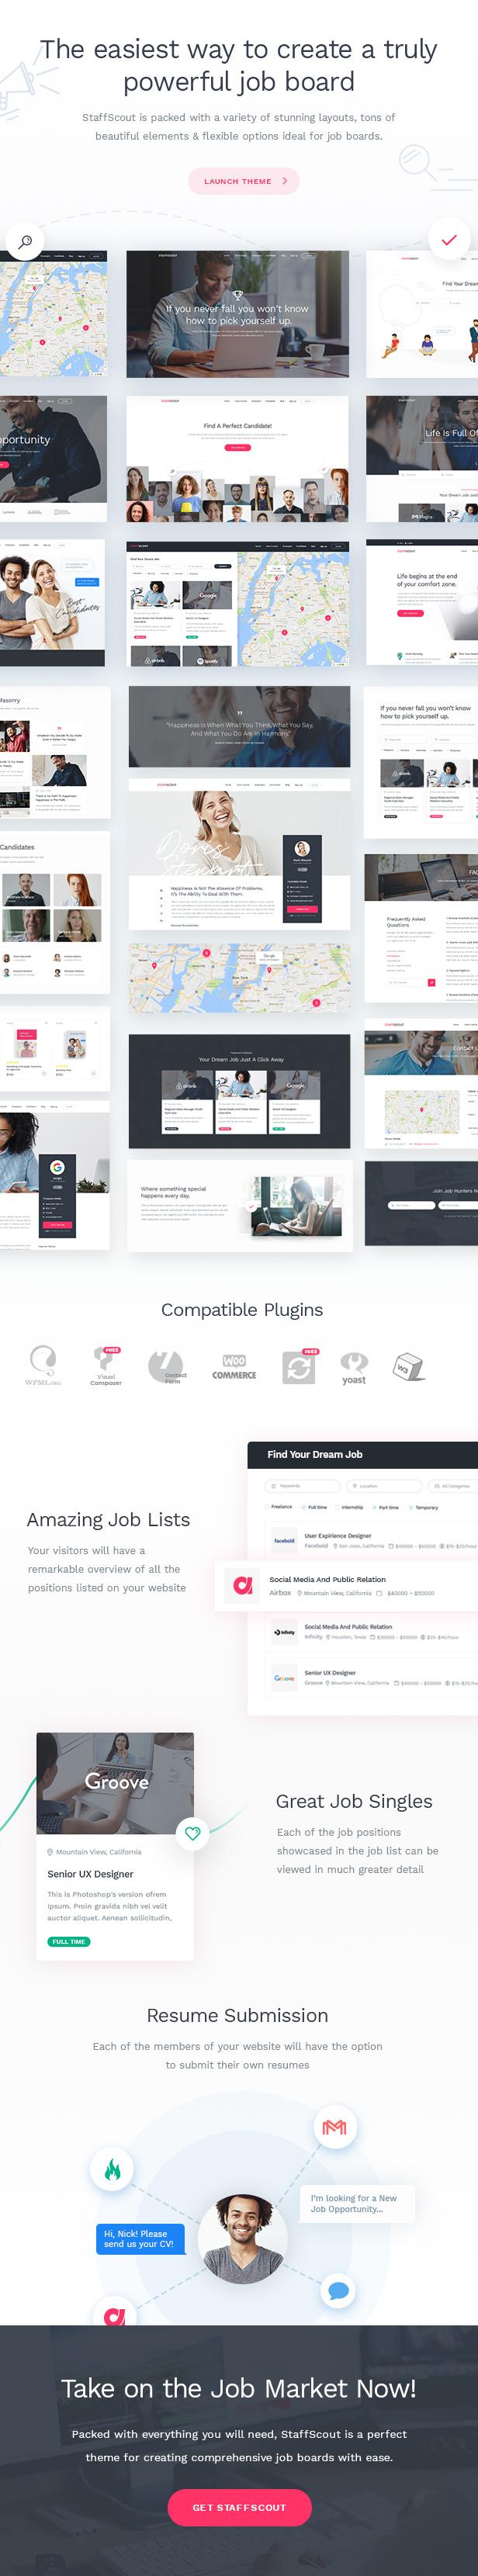 WordPress theme StaffScout - A Powerful Job Board Theme (Directory & Listings)